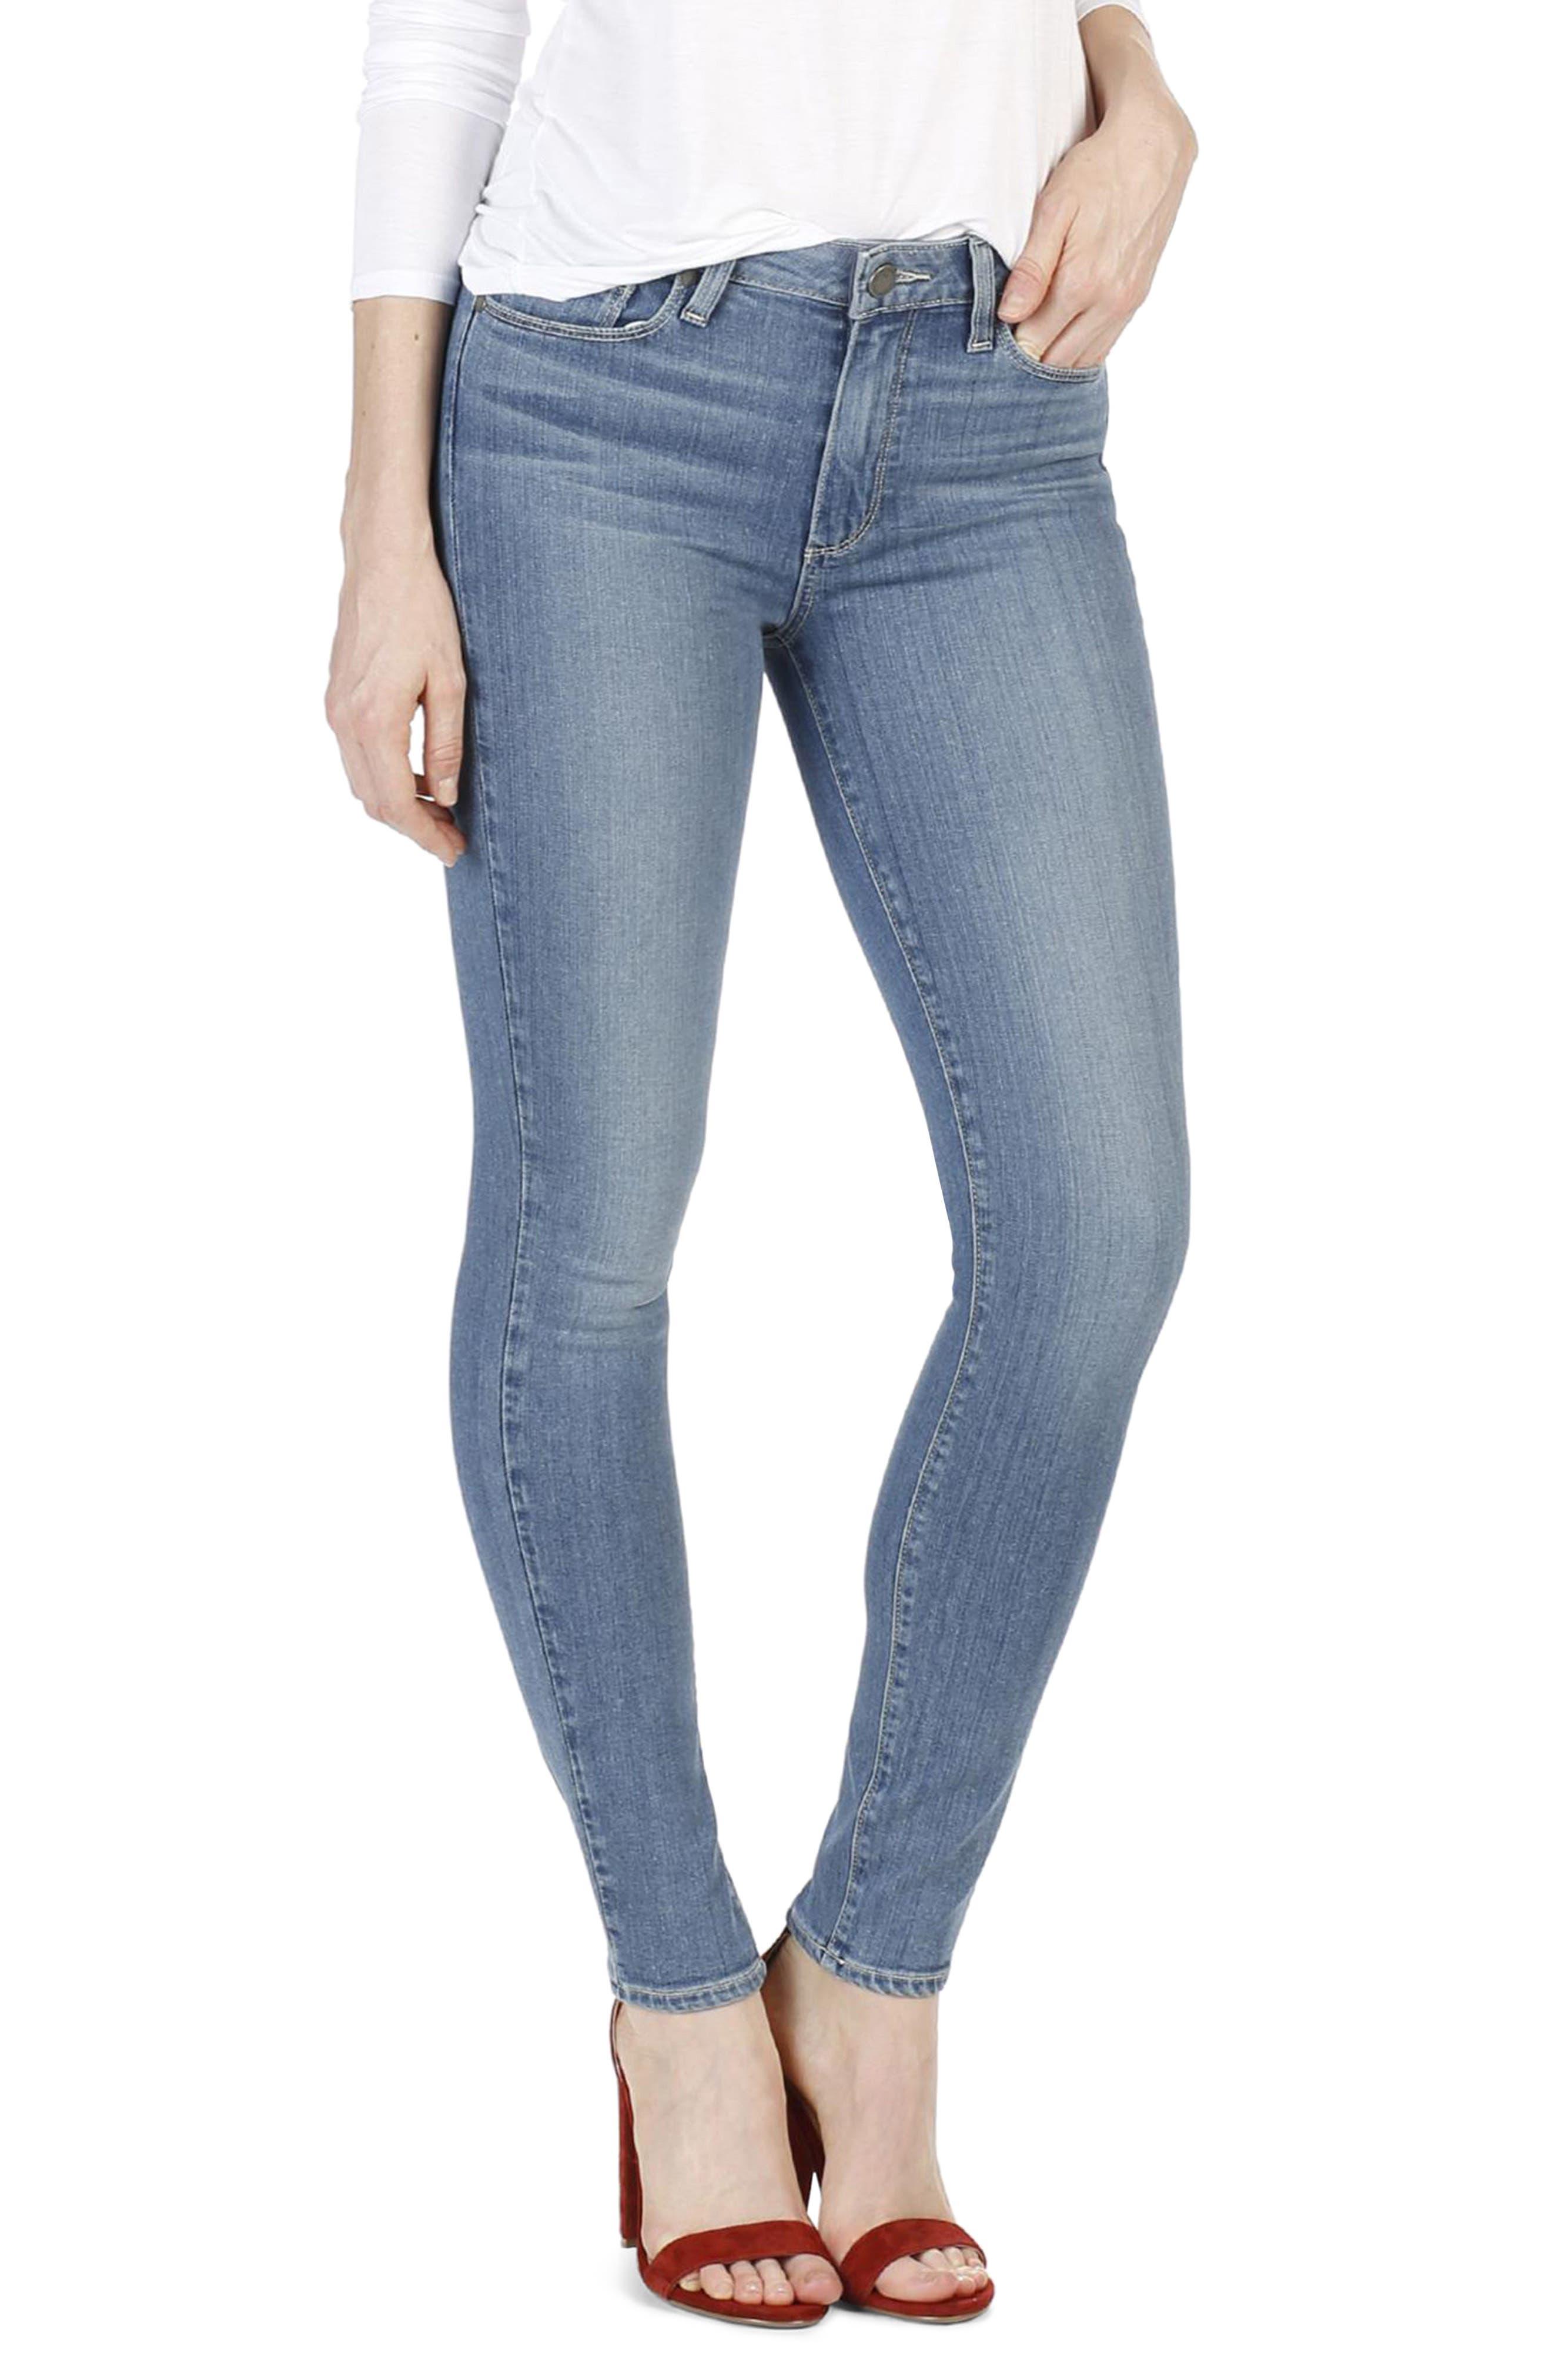 Transcend - Hoxton High Waist Ultra Skinny Jeans,                             Alternate thumbnail 2, color,                             400